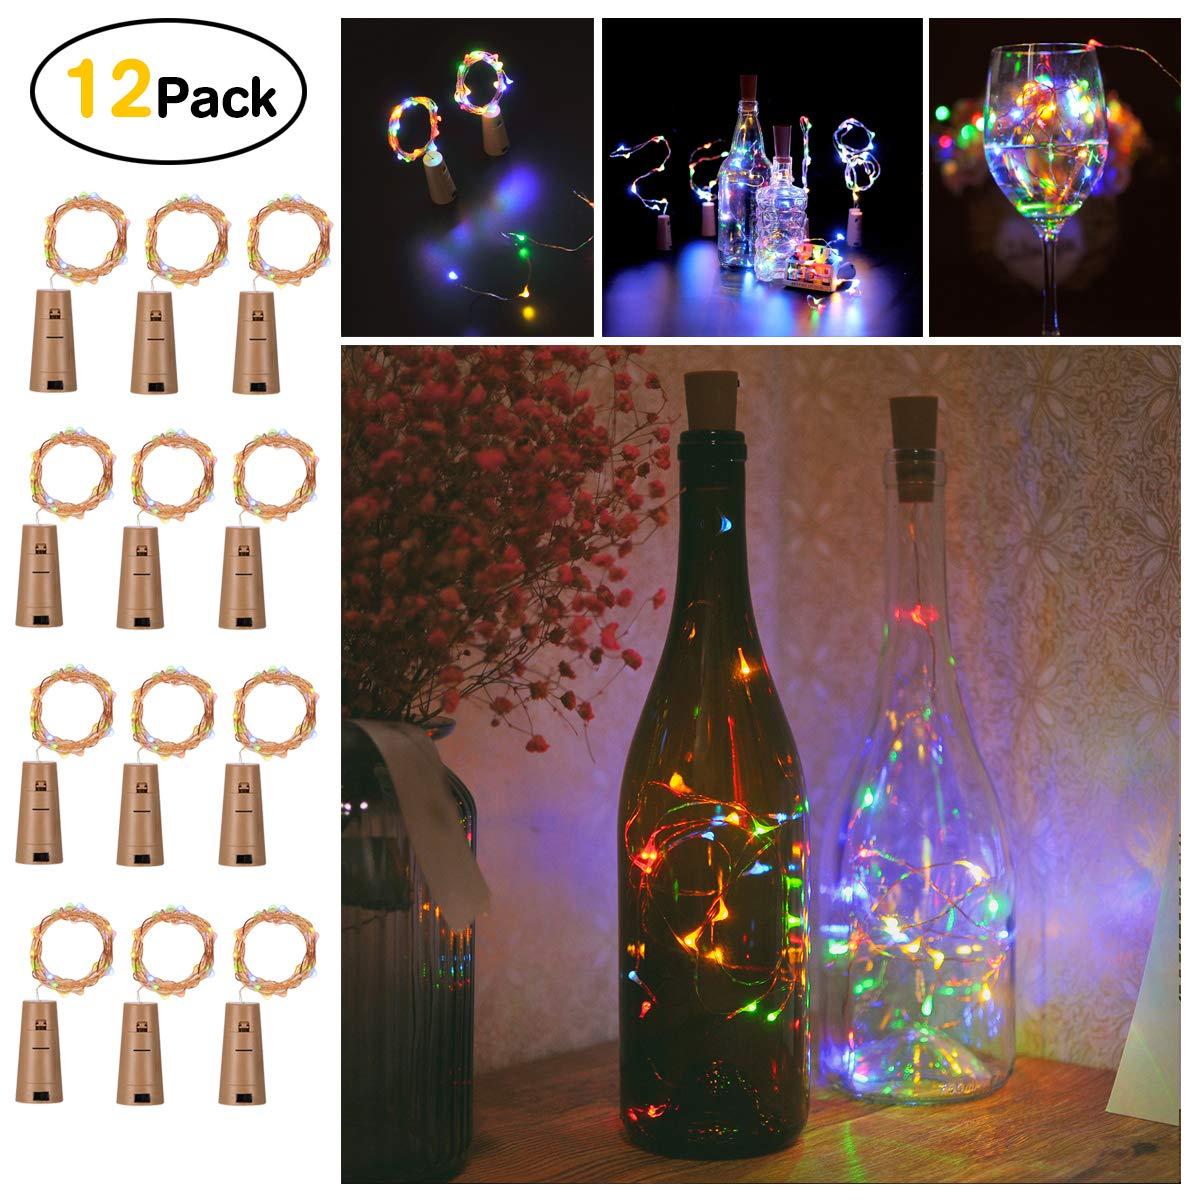 Bottles Lights, Sunniu 12 Packs Led Cork Copper Wire Starry Wine Bottle Fairy Lights, Battery Powered Cork Lights Multi Color Bottle Lights for Bedroom, Parties, Wedding, Decoration (2m/7.2ft Multi-Colored)